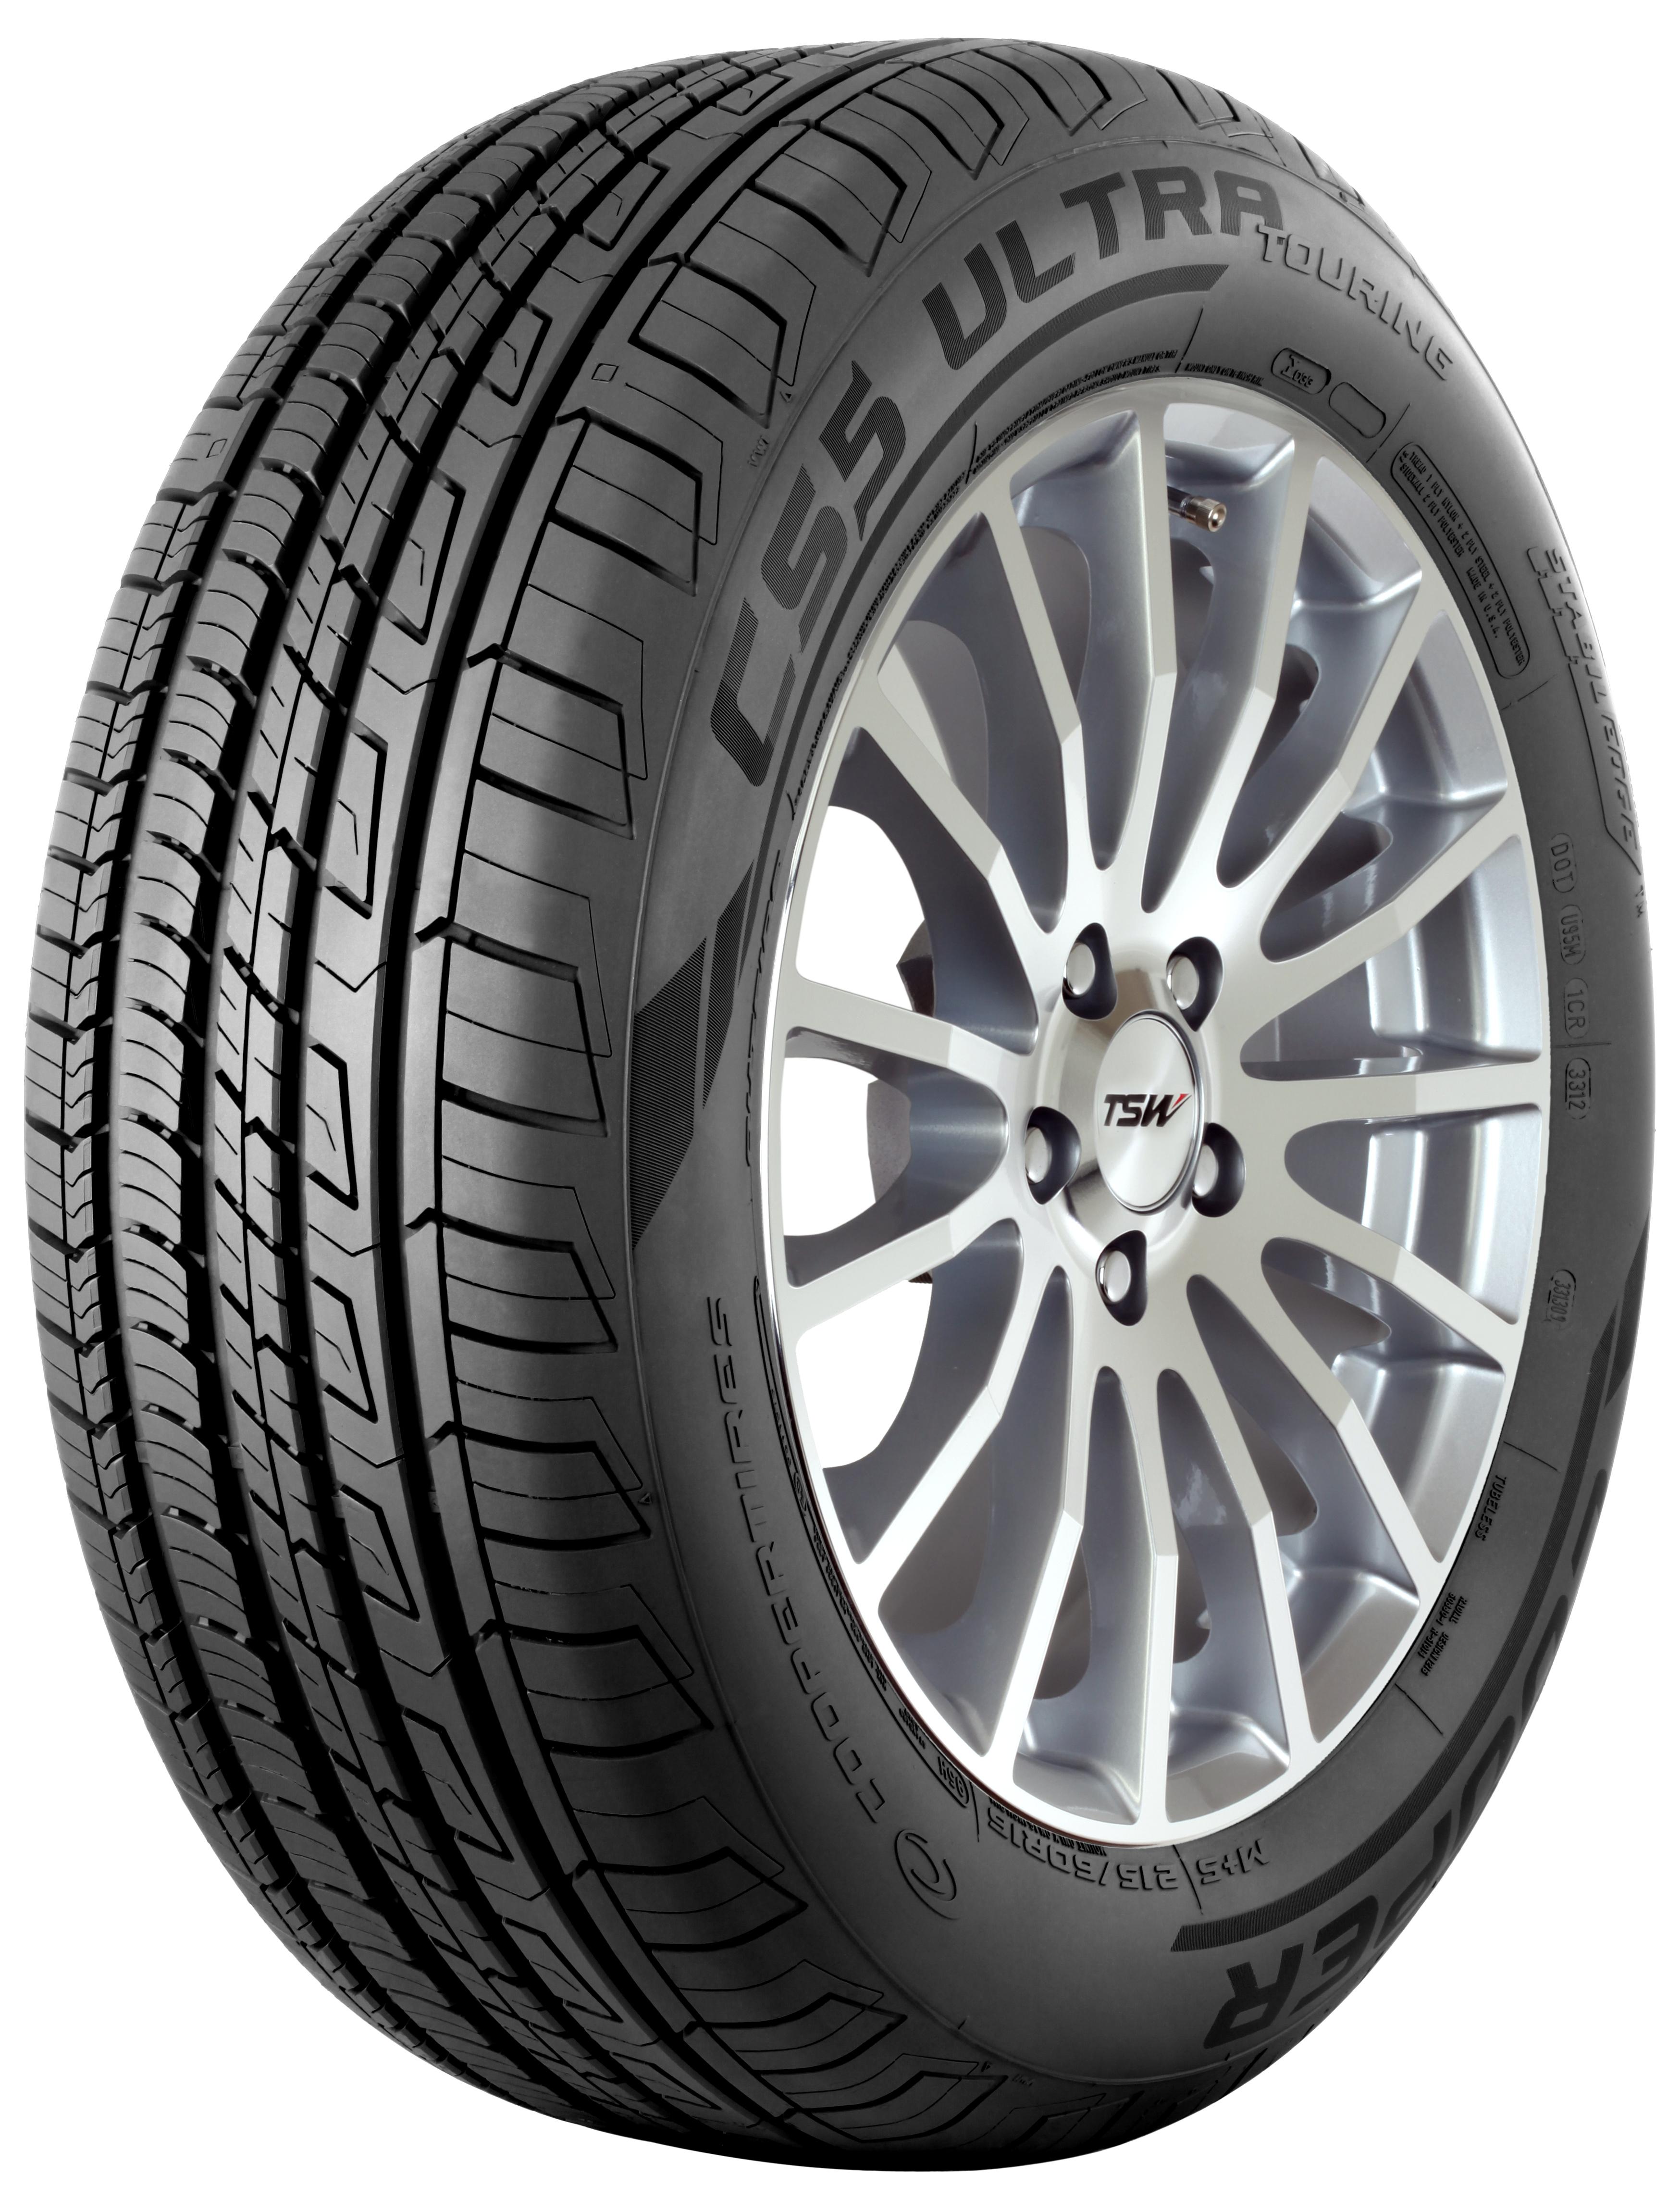 Cooper Tires Summer Drive Event #CooperTire